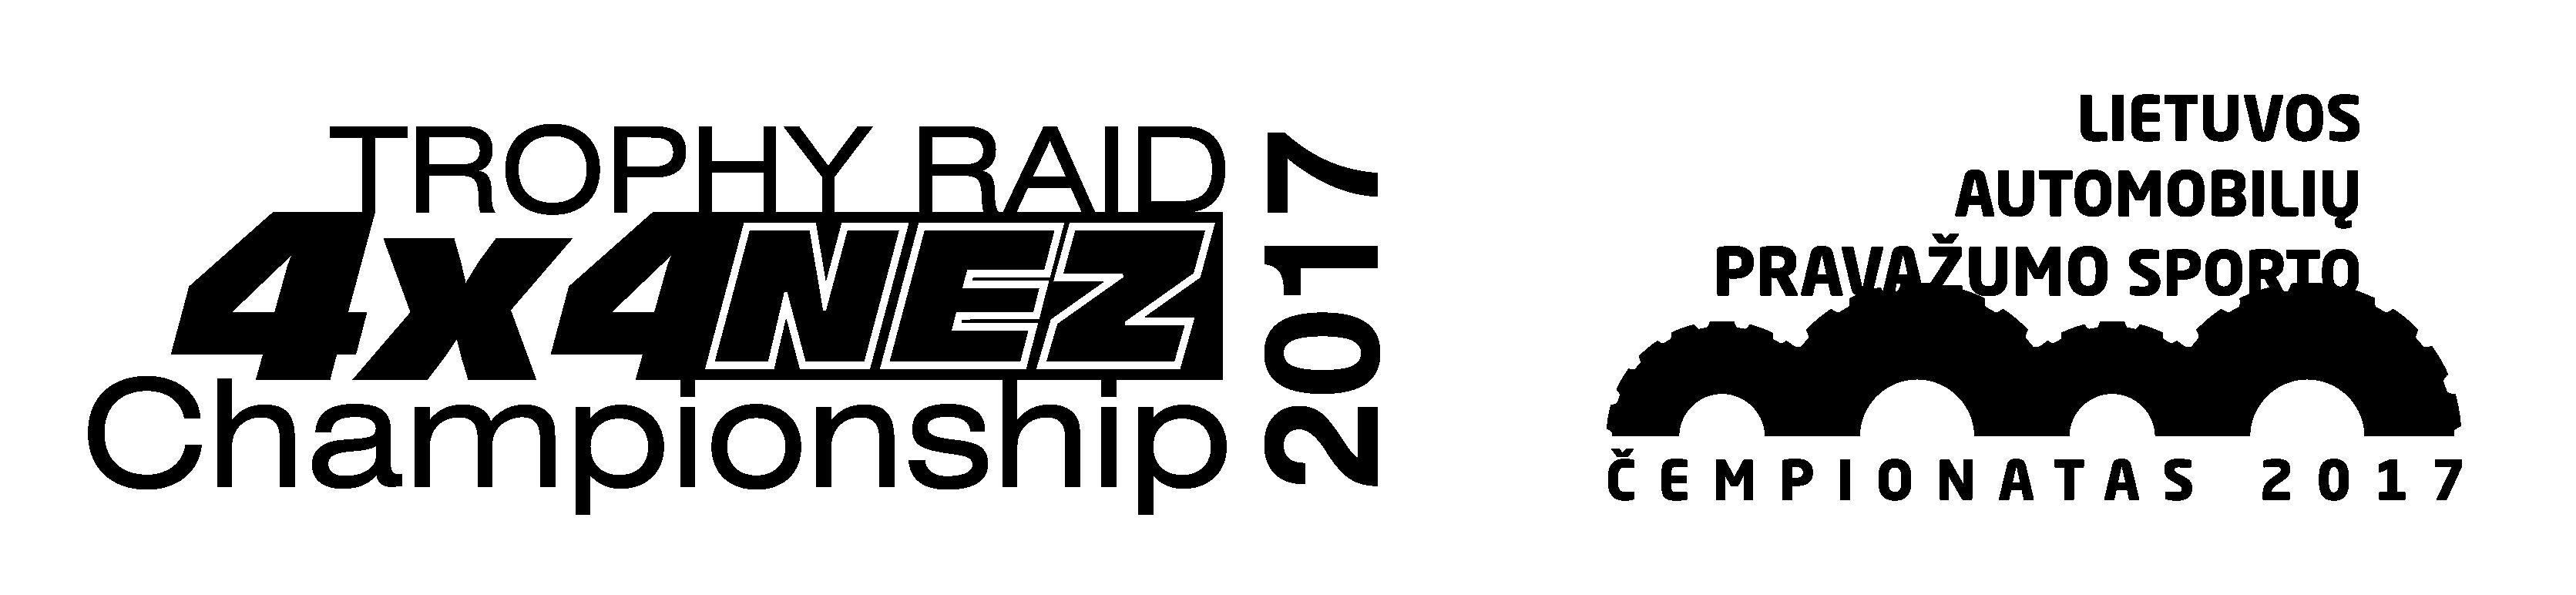 2017 parvazumo logo